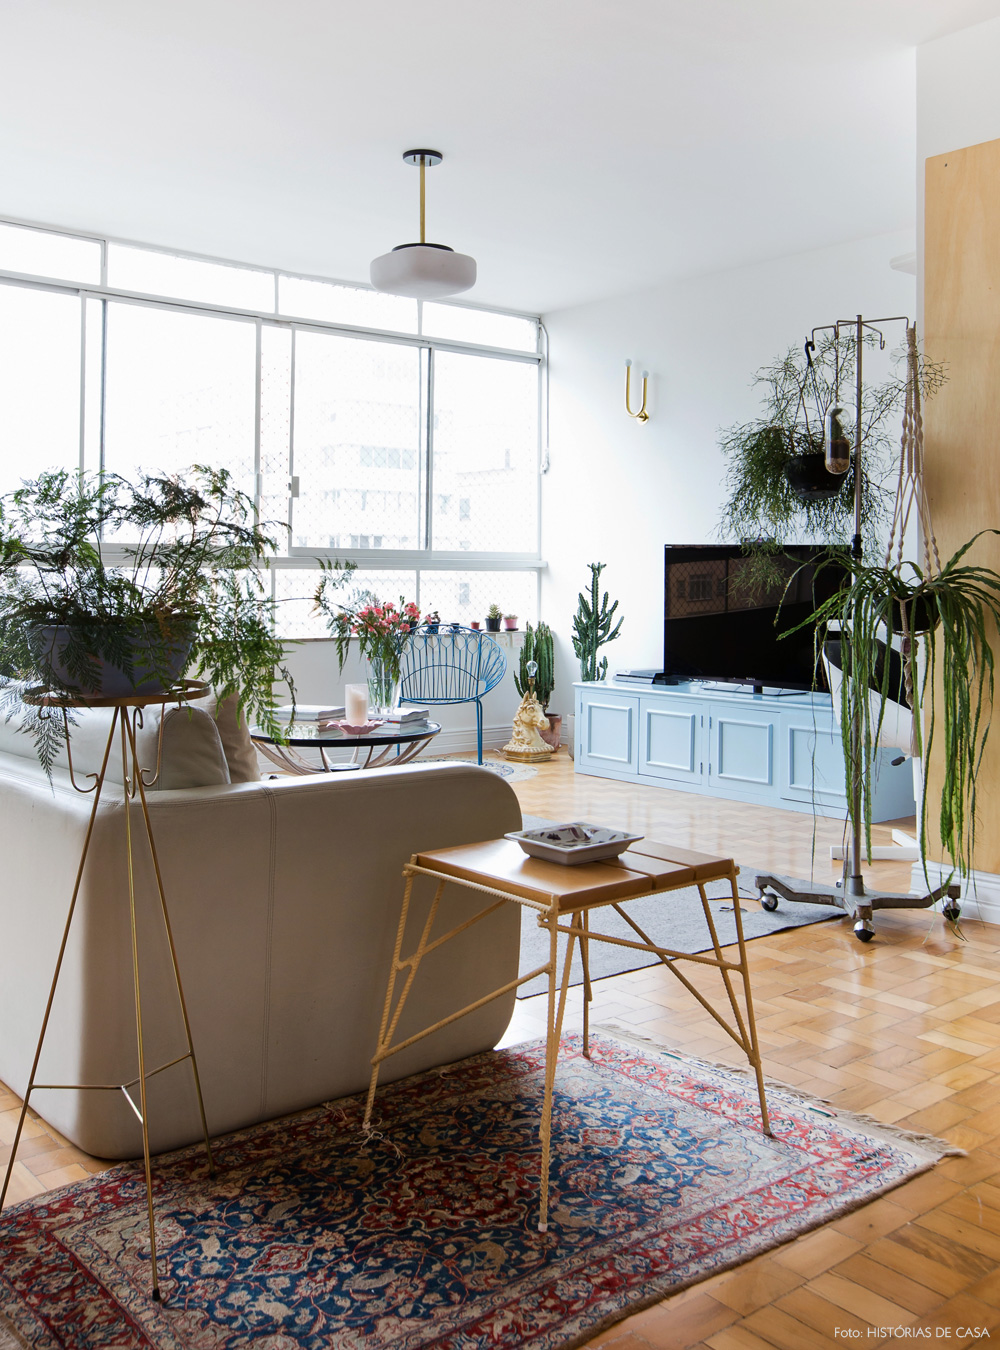 04-decoracao-sala-tv-plantas-sofa-cinza-tapetes